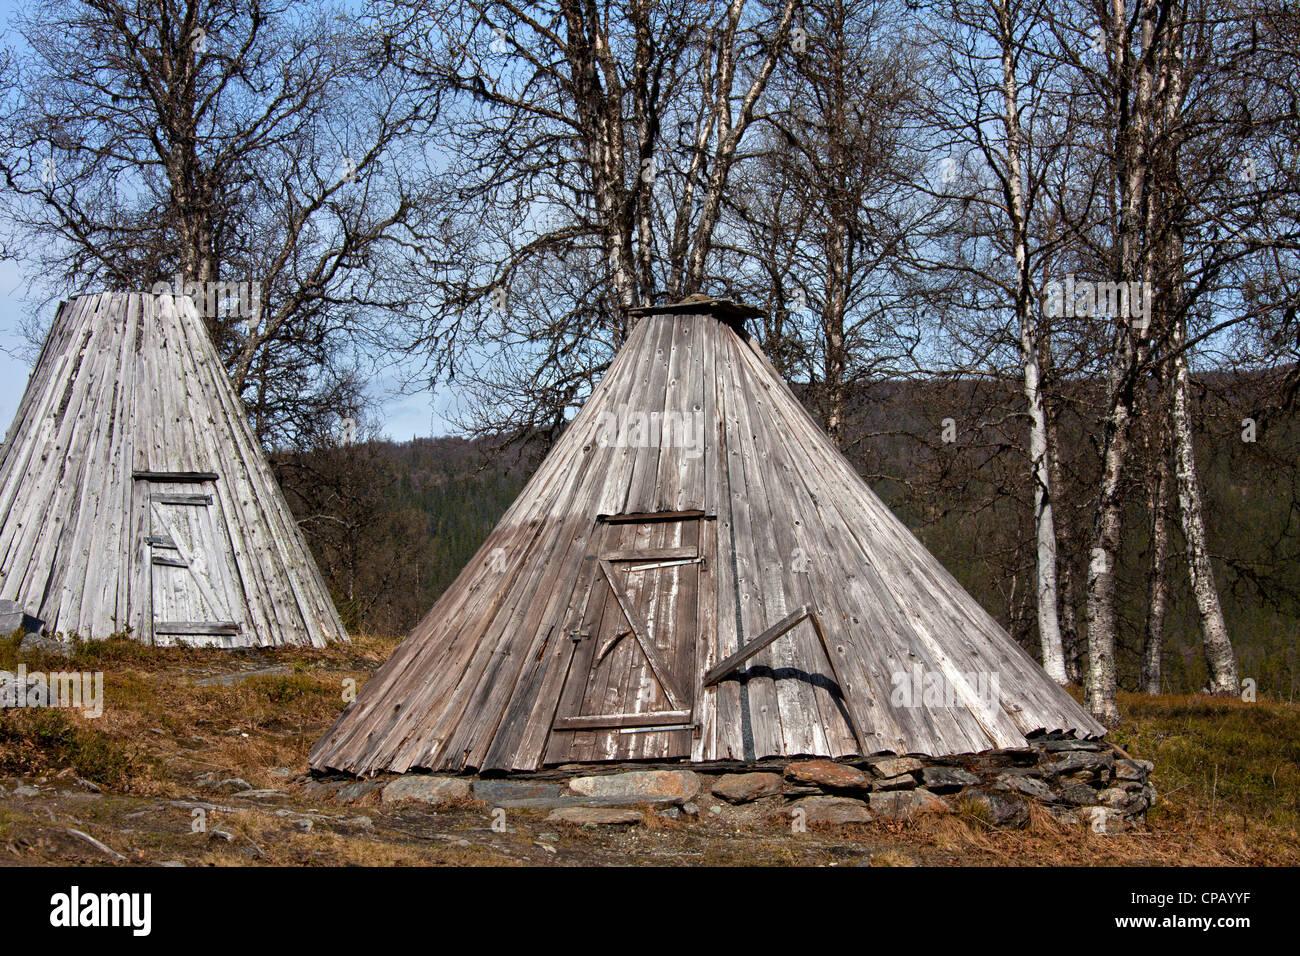 Goahti / Kota, traditionelle Sami Holzhütten in der Tundra, Lappland, Schweden Stockbild